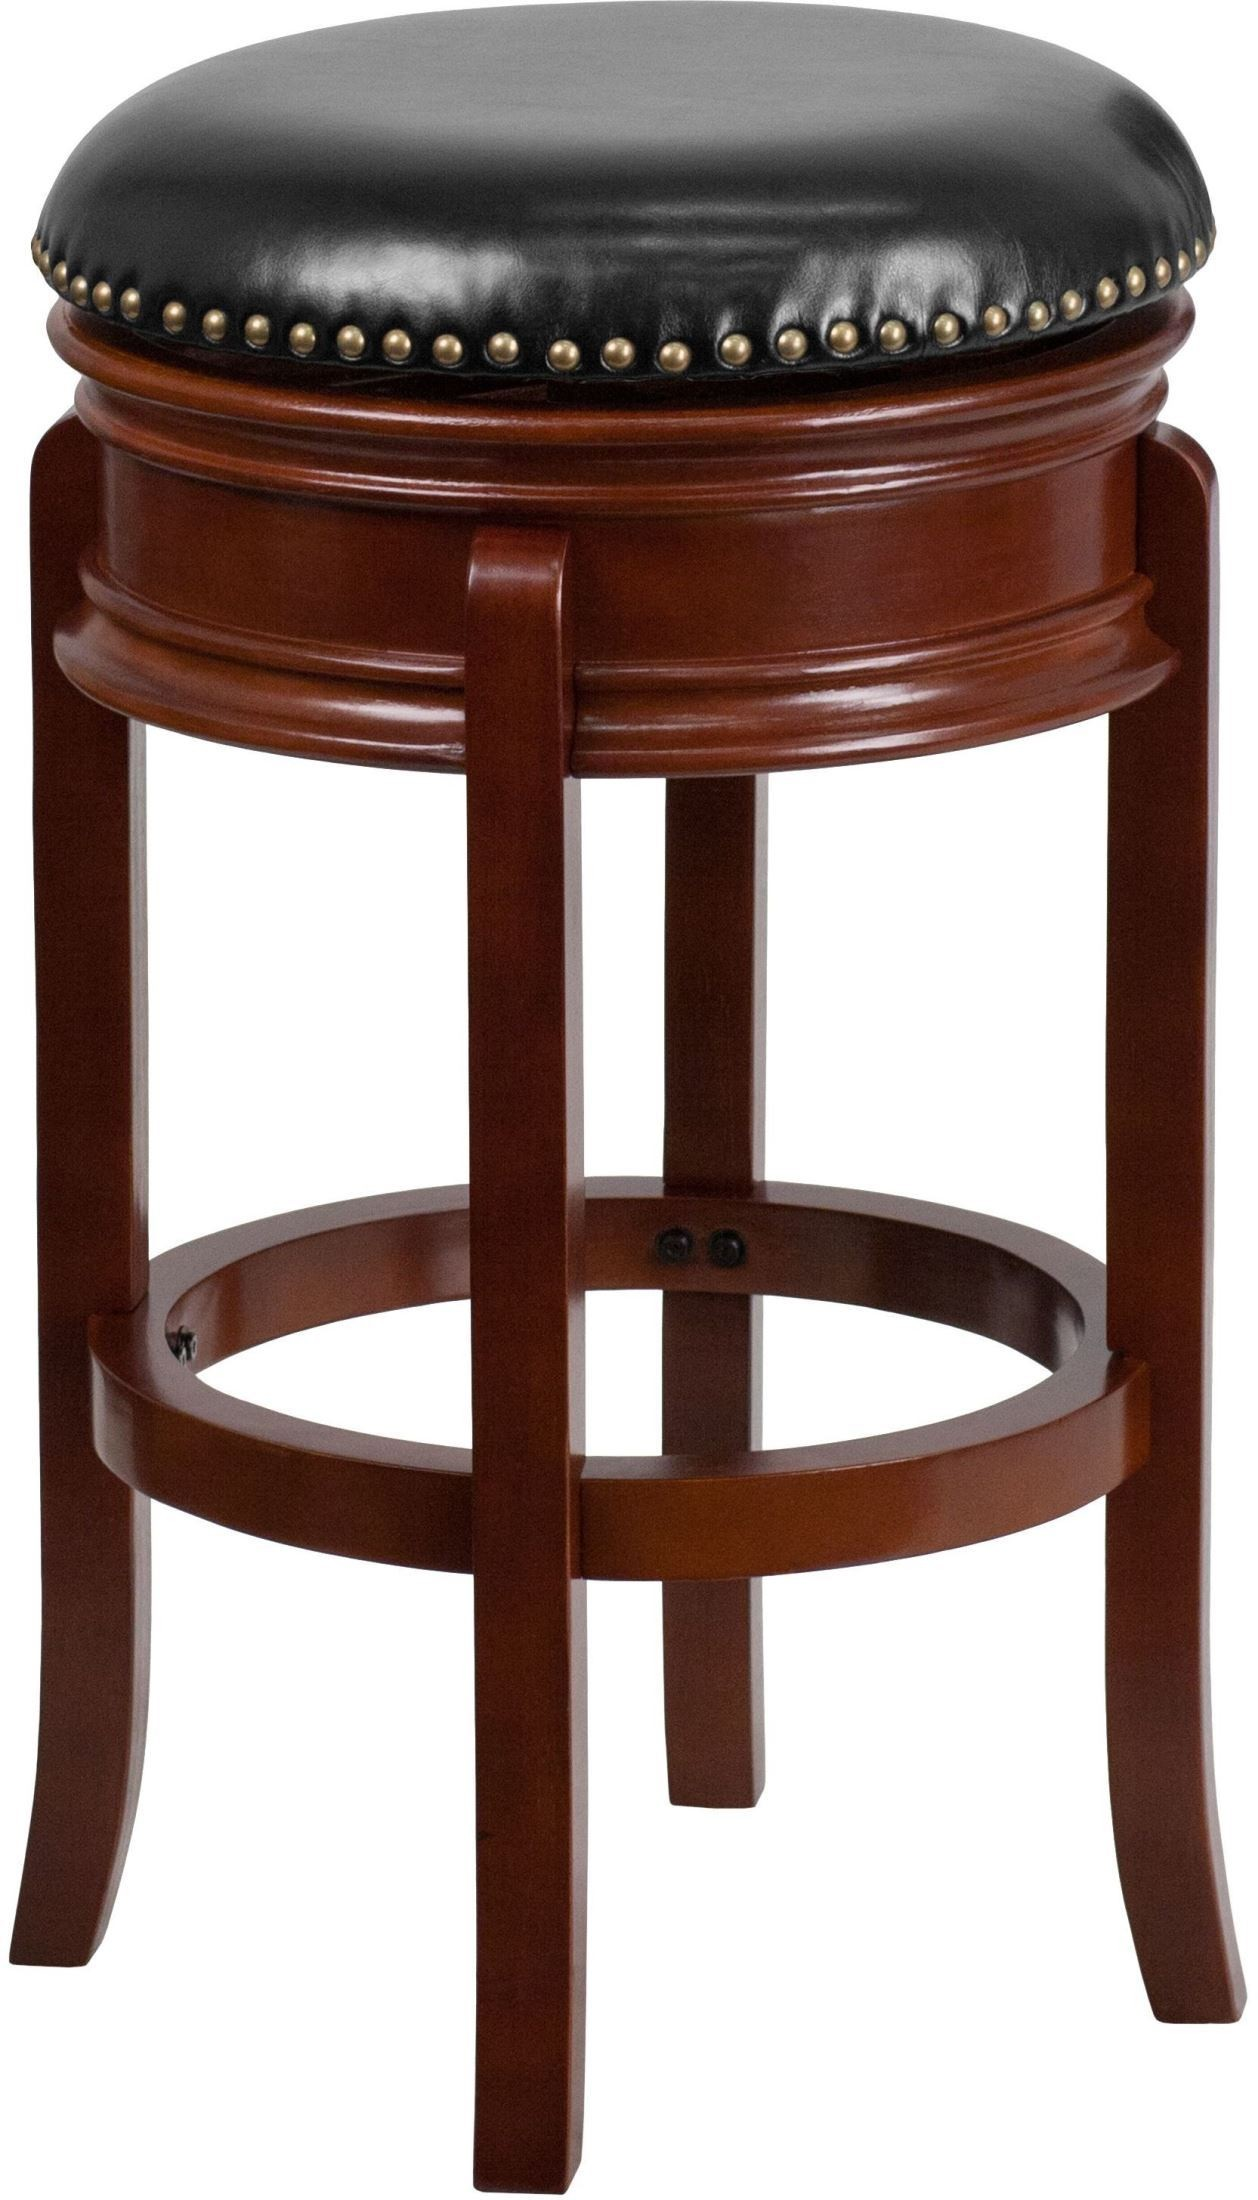 29 transitional black swivel backless light cherry wood barstool ta 68829 lc gg renegade. Black Bedroom Furniture Sets. Home Design Ideas